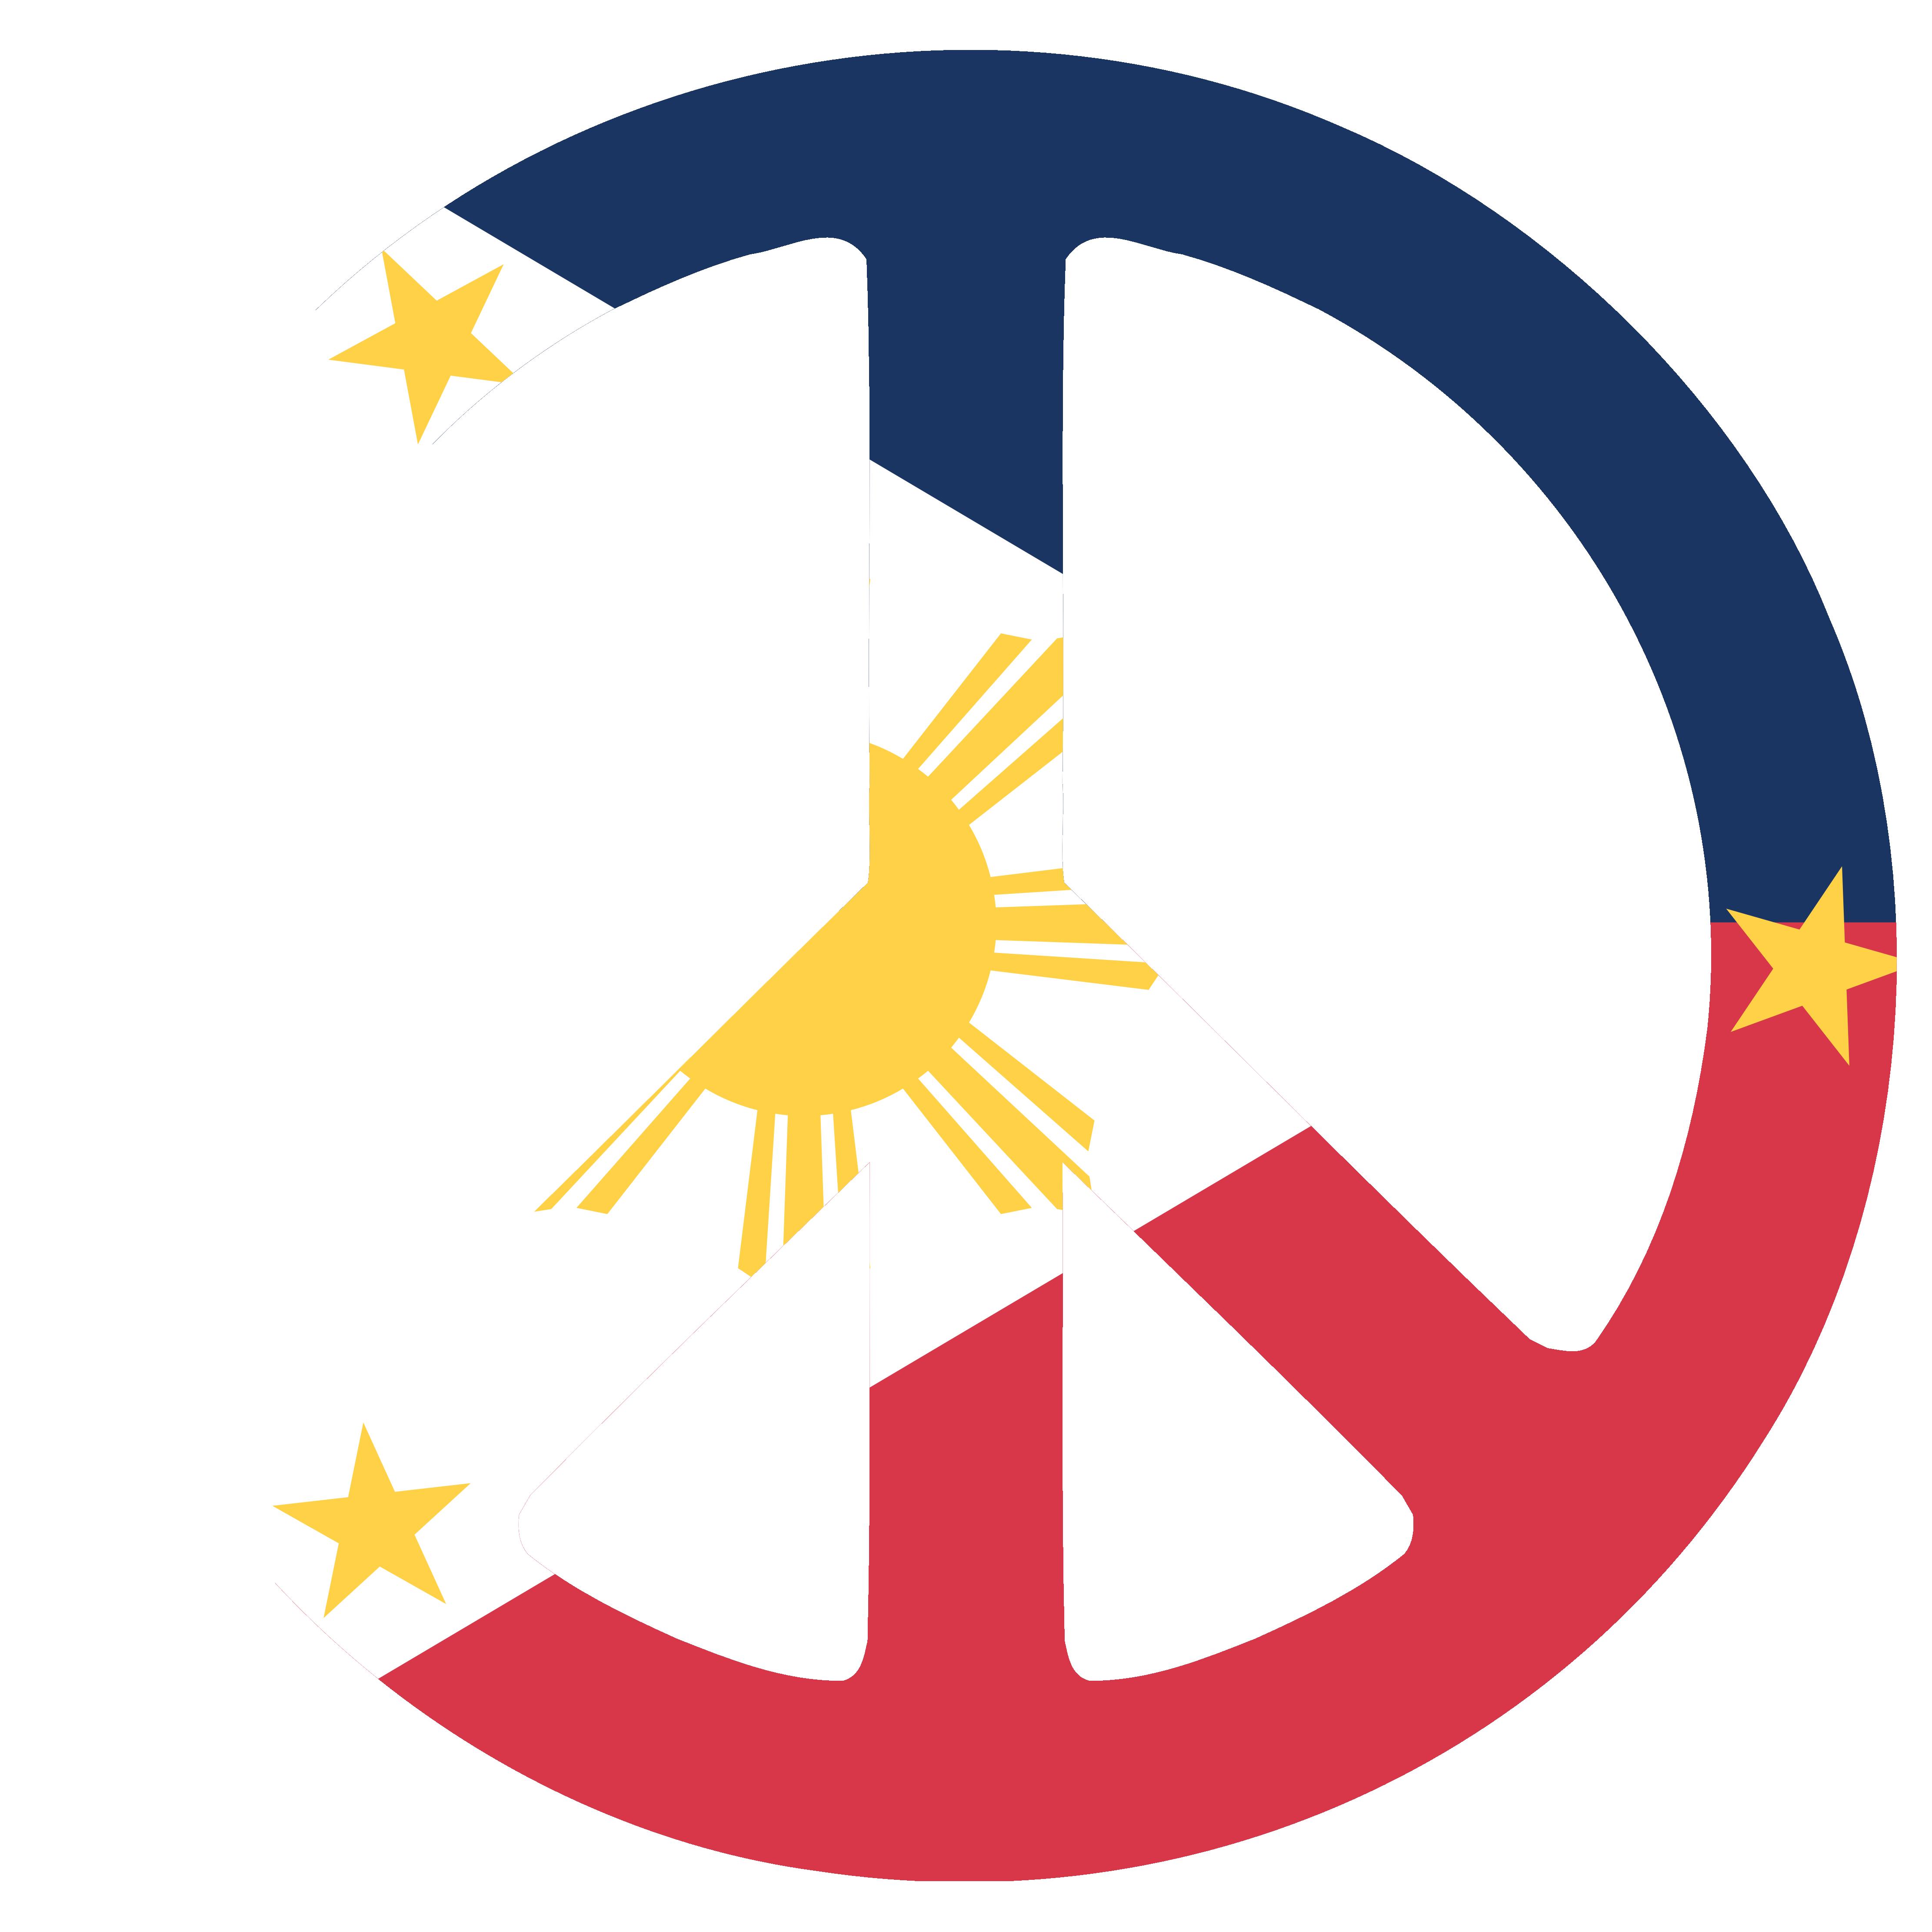 Mango clipart philippine symbol. Flag of the philippines